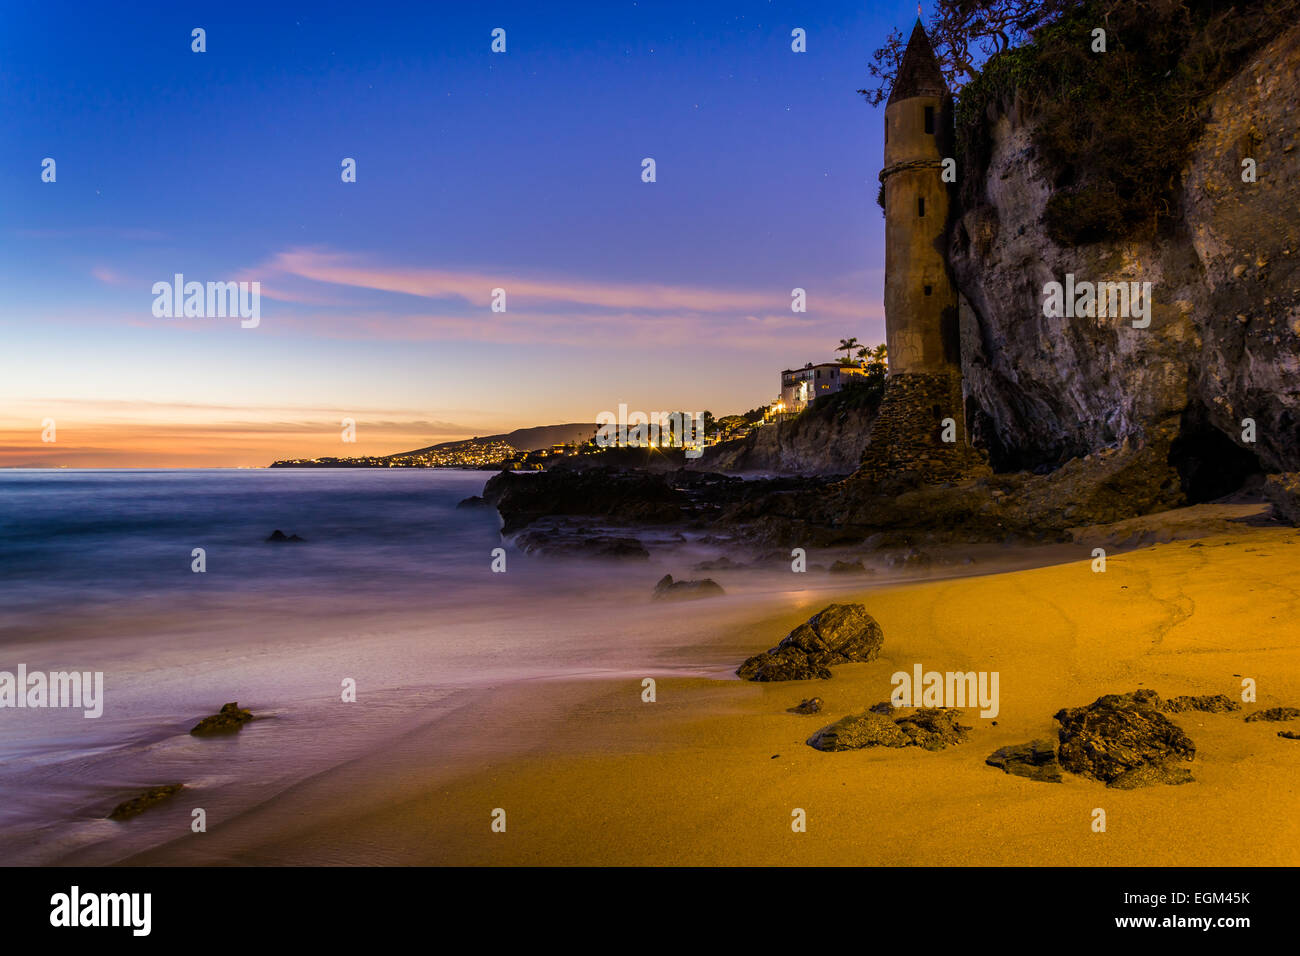 Victoria Tower at sunset, at Victoria Beach, Laguna Beach, California. Stock Photo